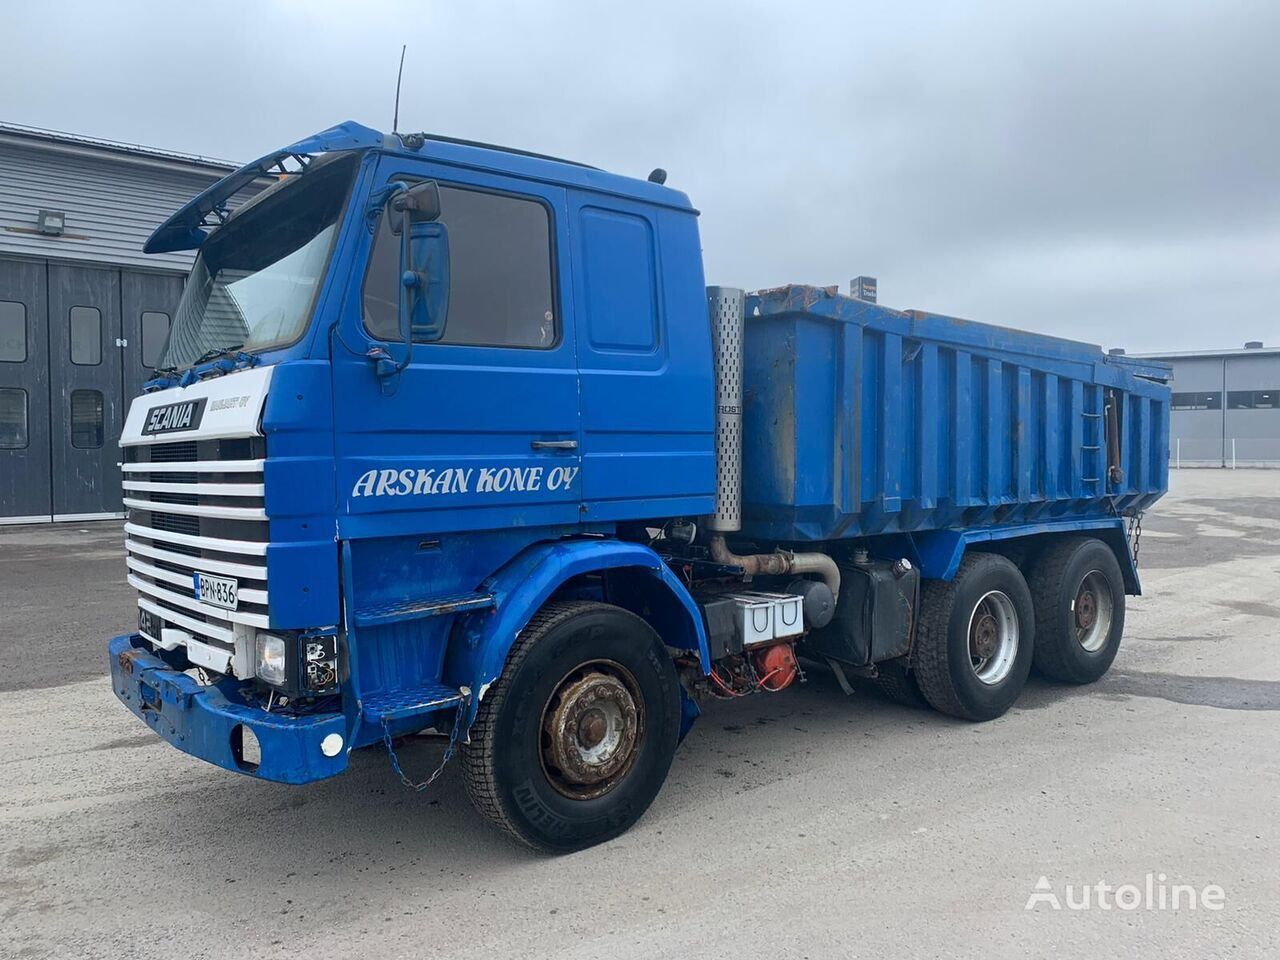 SCANIA R142 6x4 32 tons heavy kipper full spring dump truck